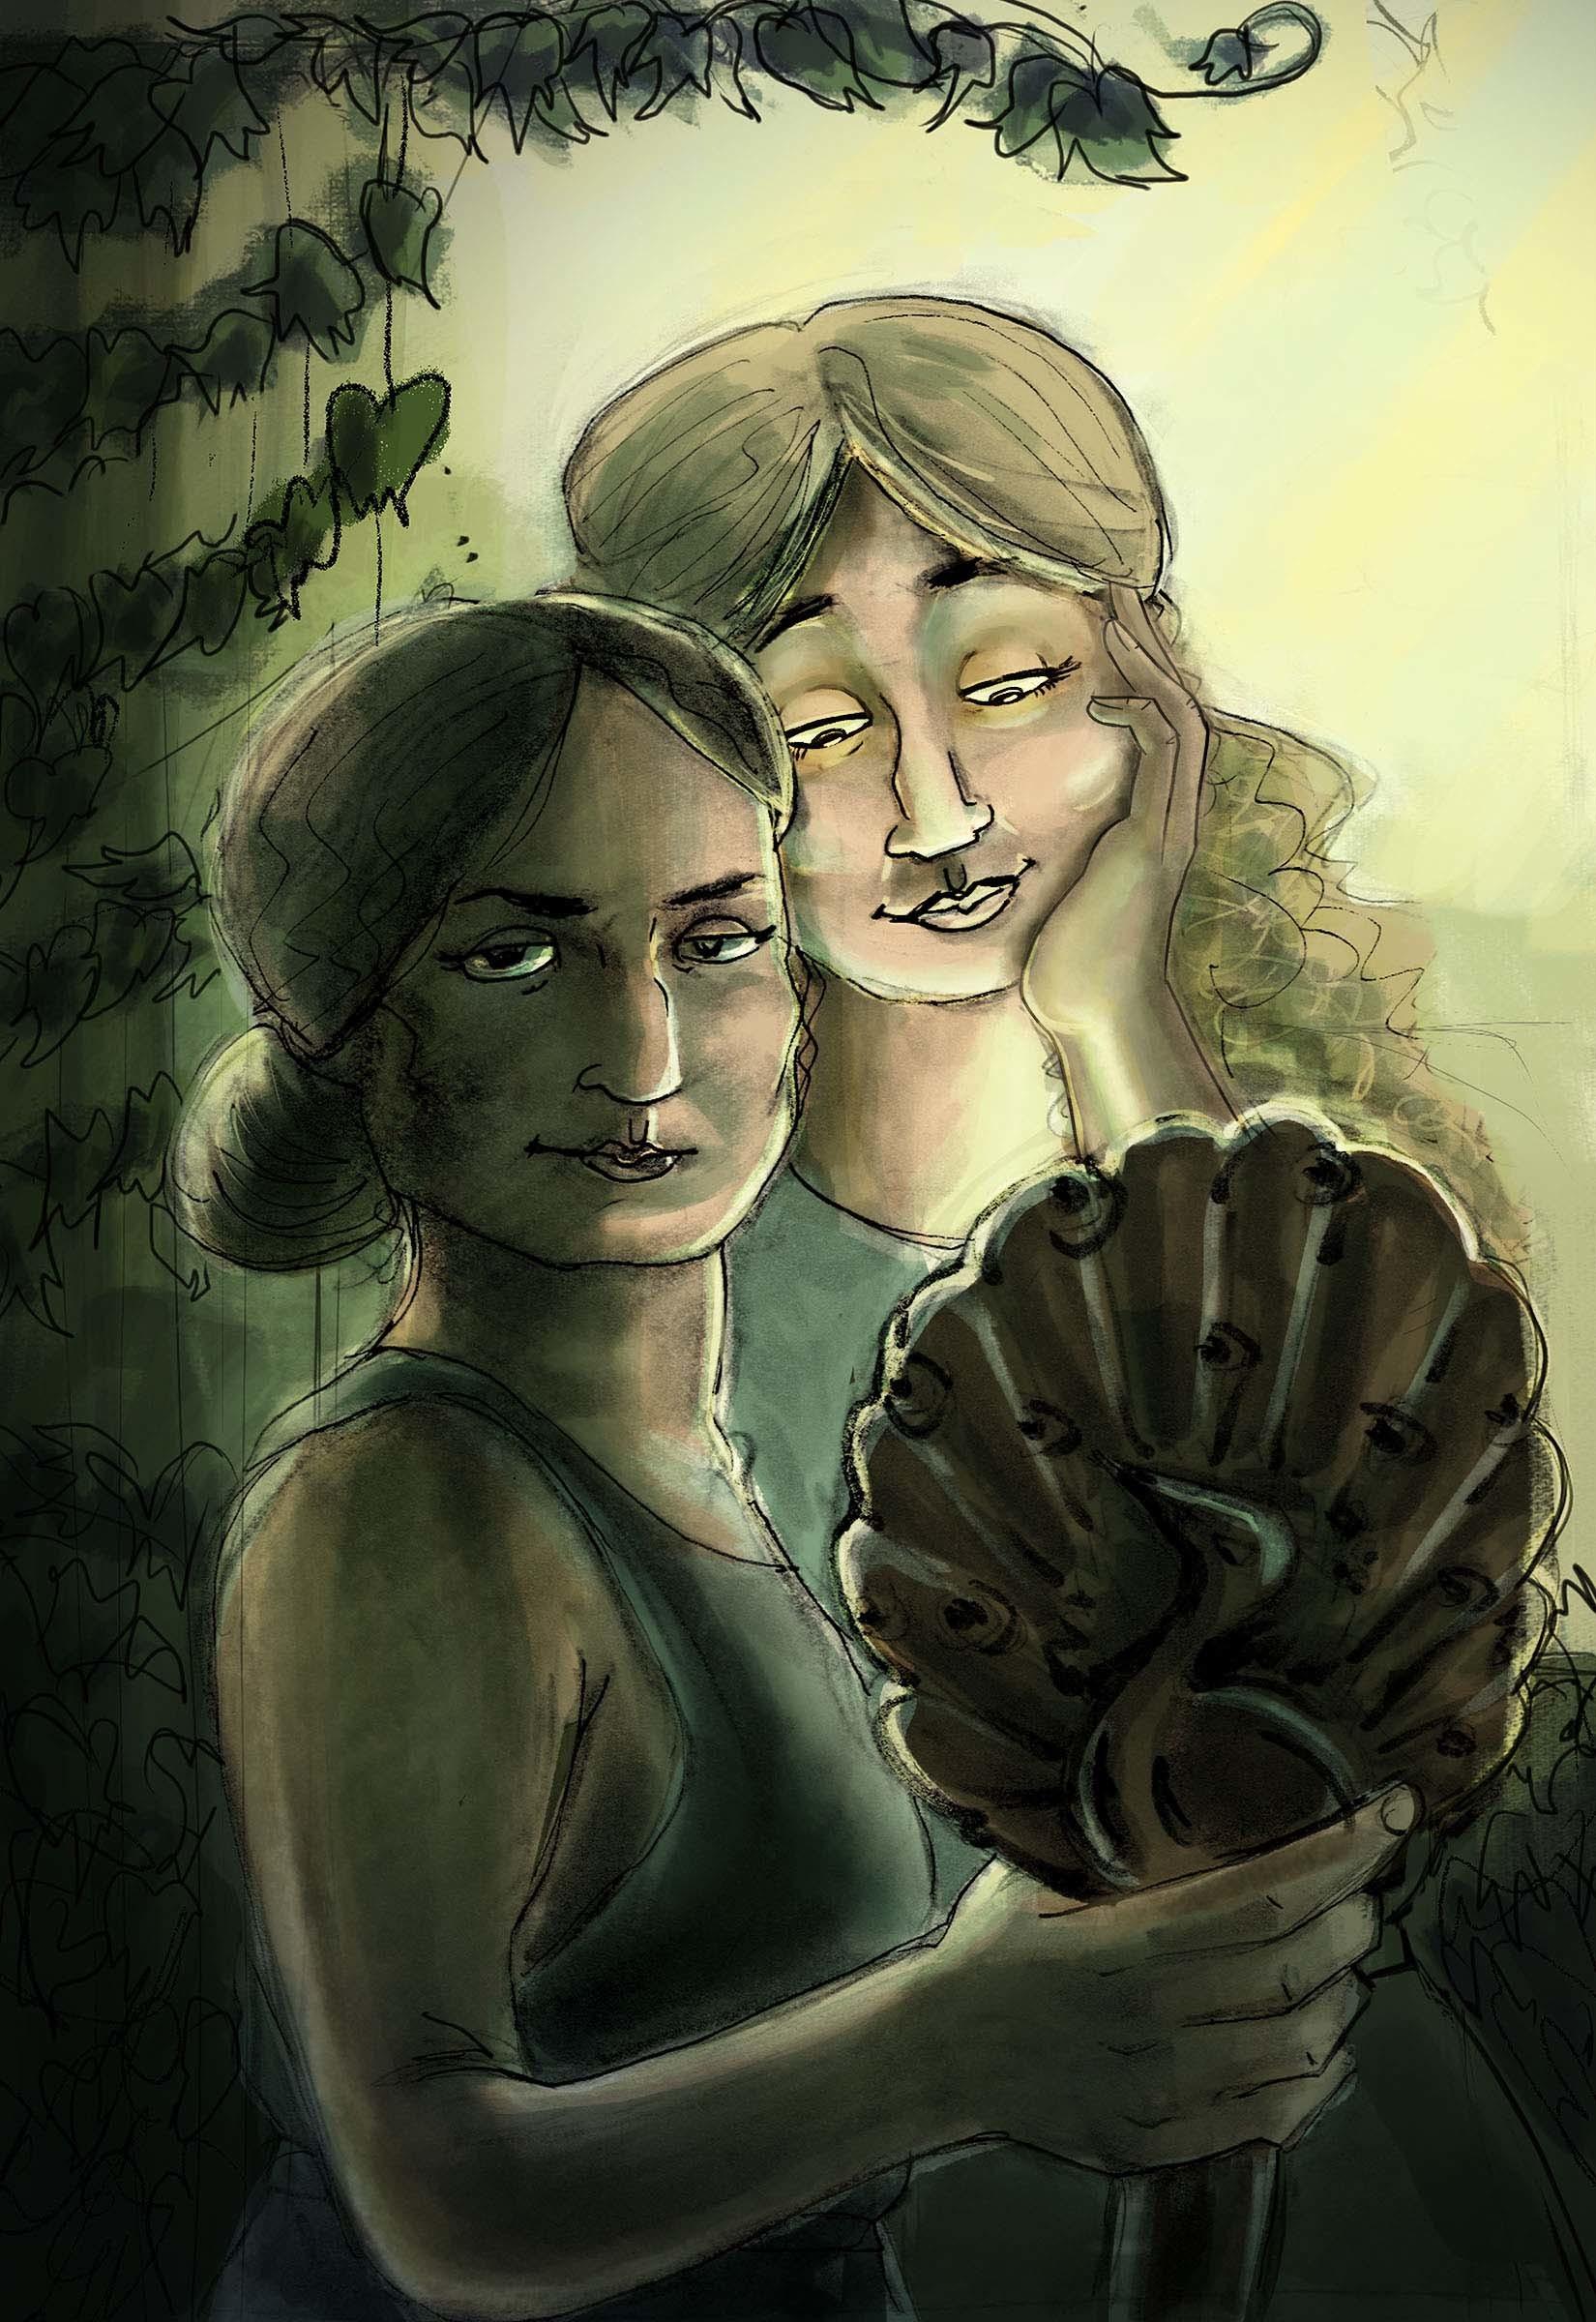 Semele student artwork from MassArt, Shea